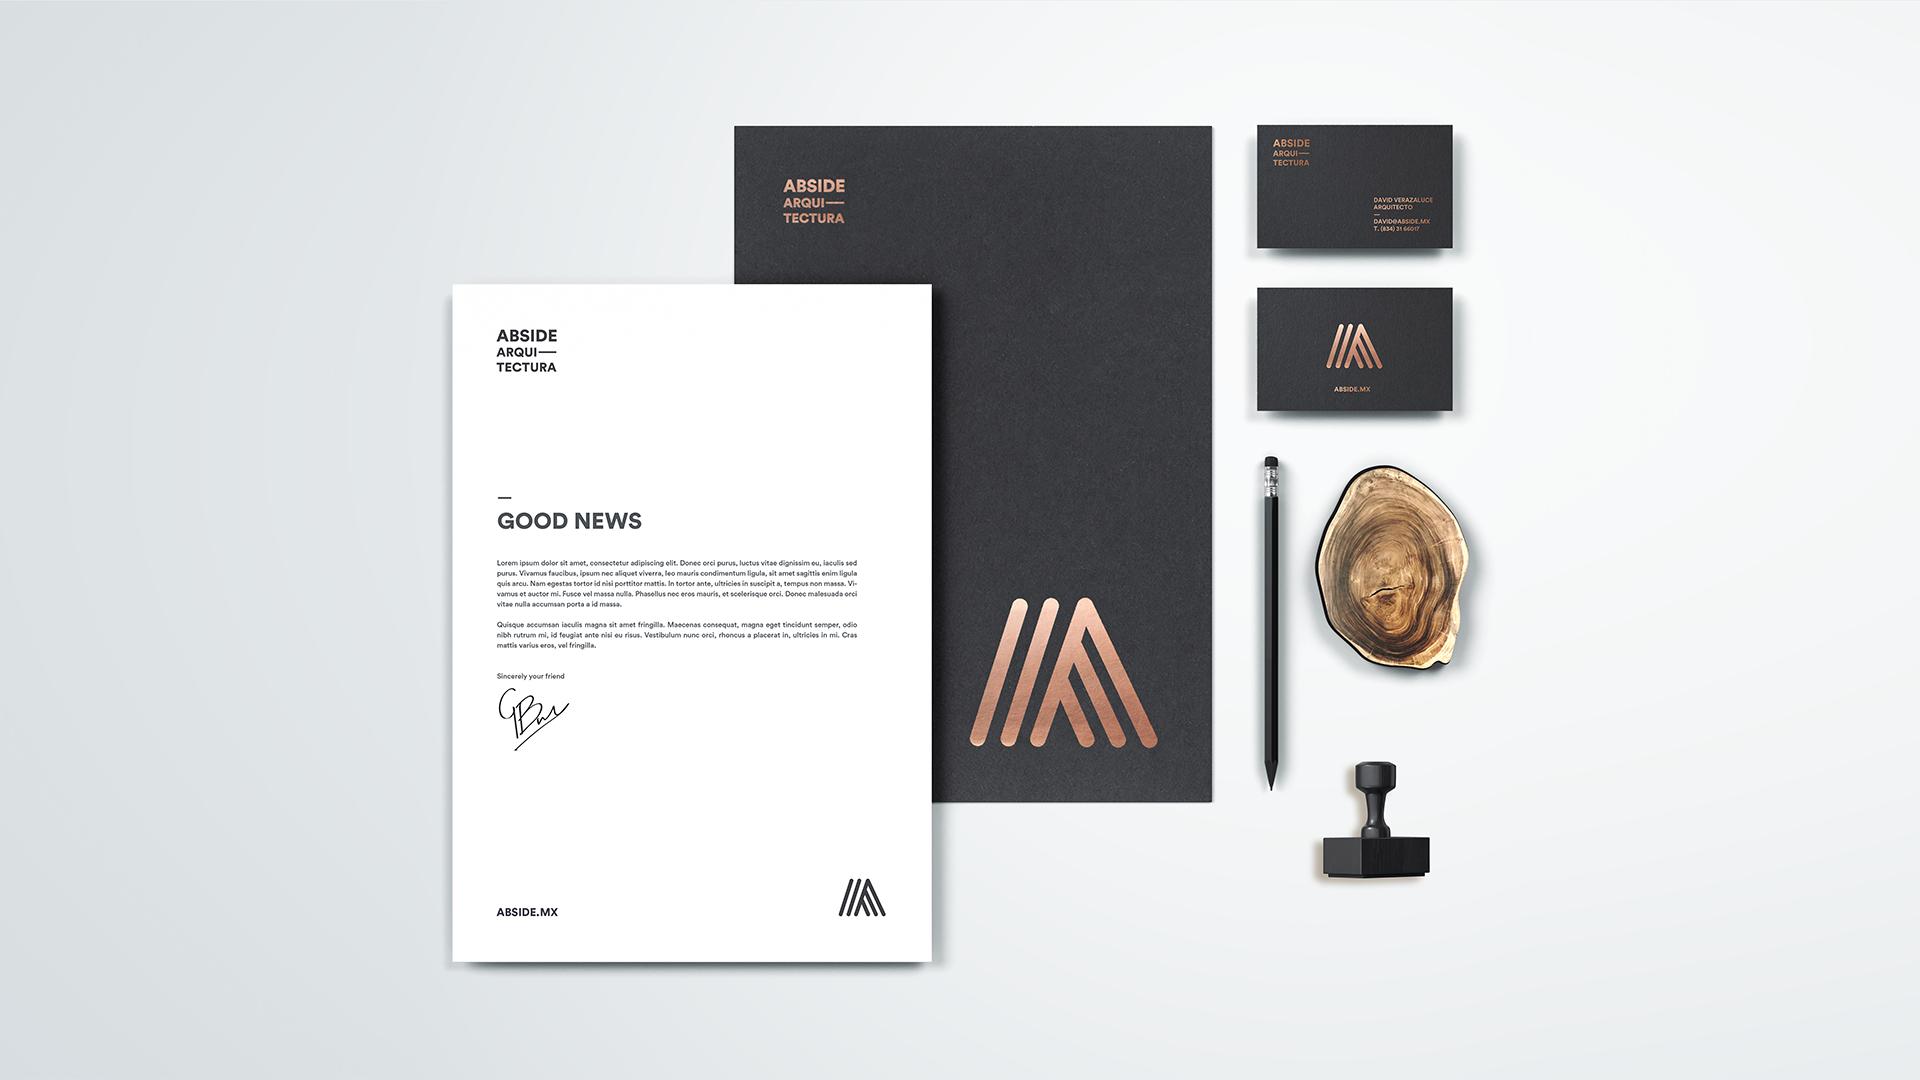 branding-abside-yoenpaperland